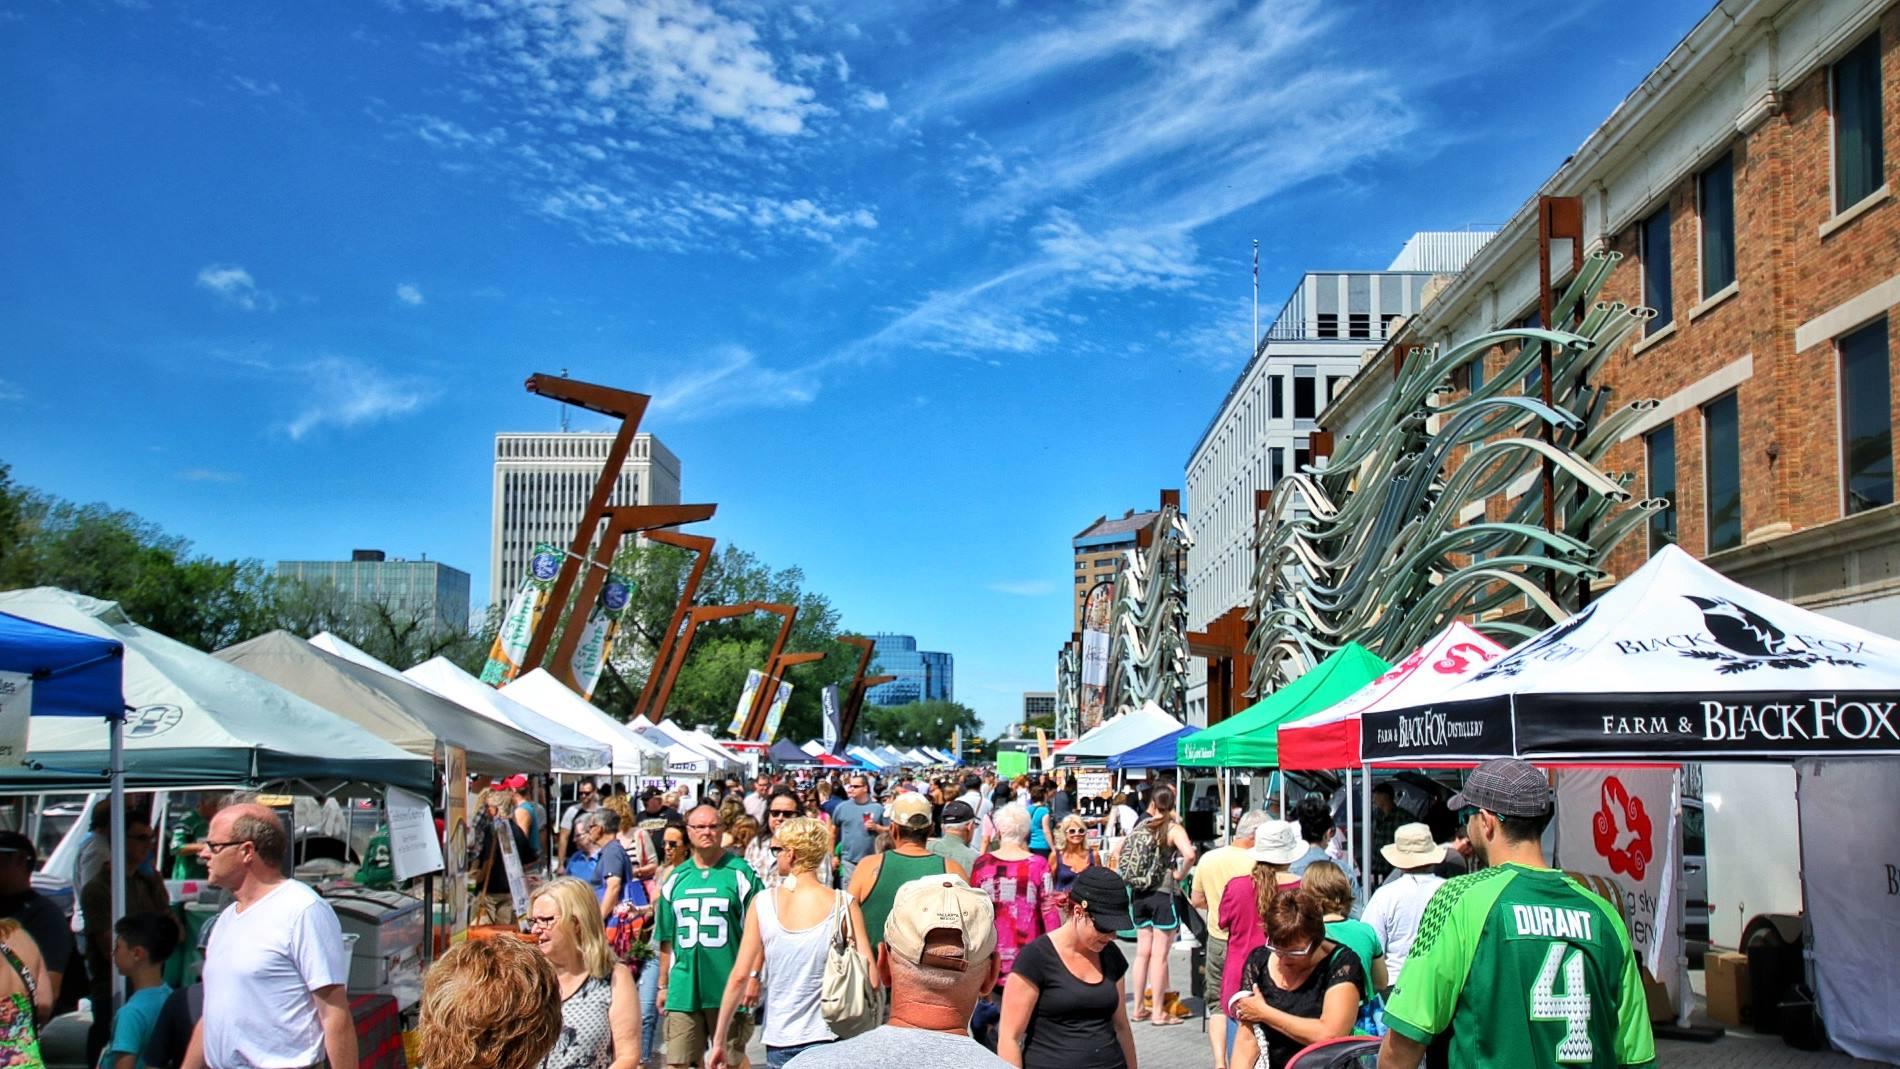 FIRST Outdoor Farmers' Market